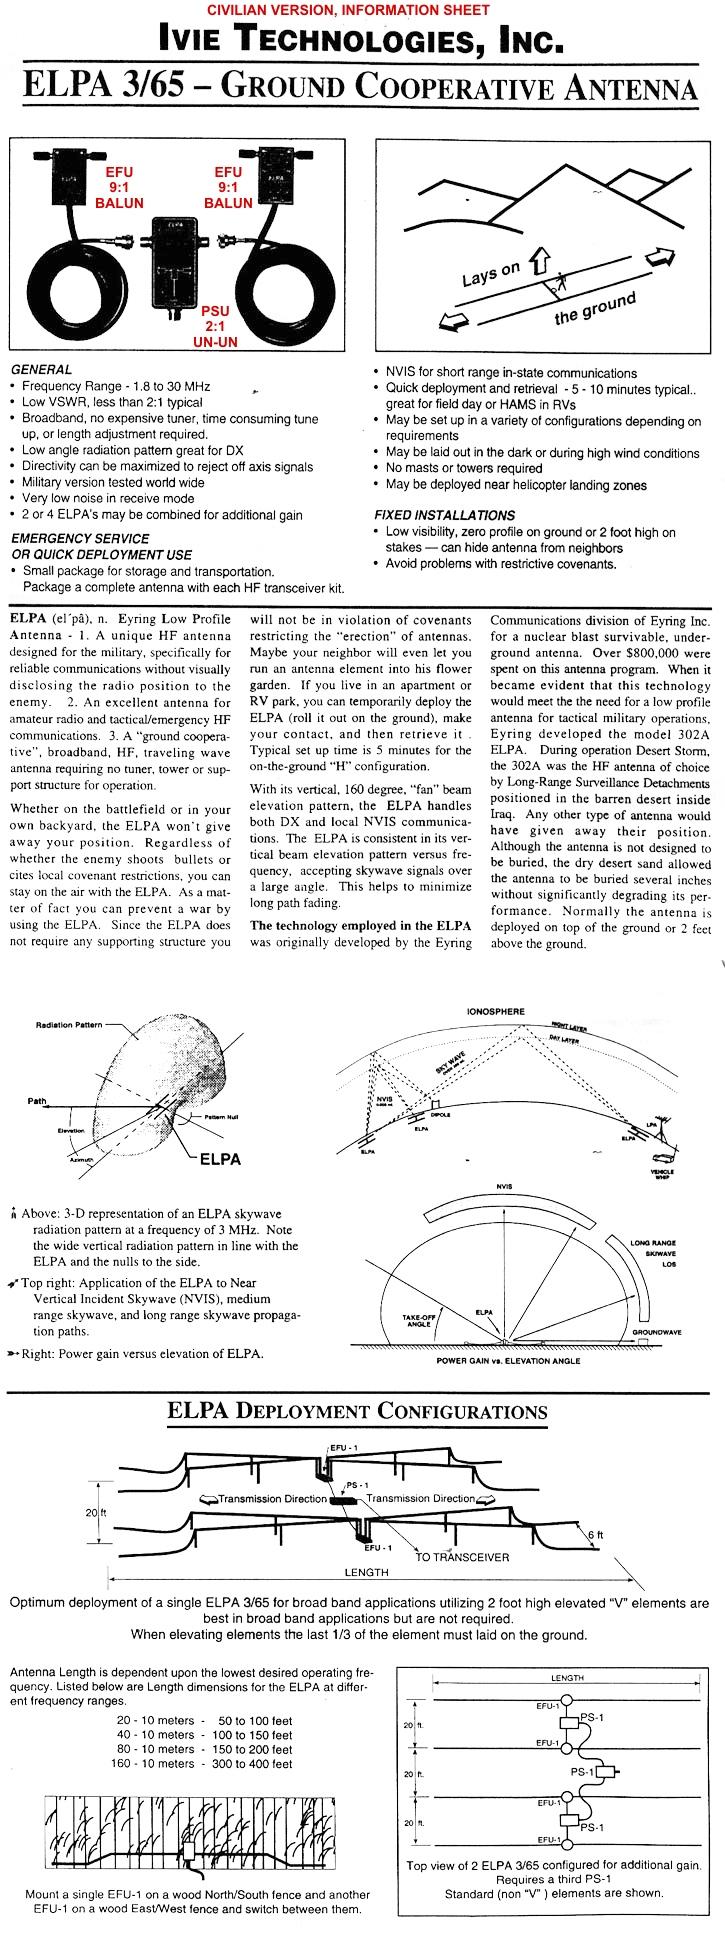 ELPA 3-65 Ground Cooperative Antenna by Ivie Technologies Inc